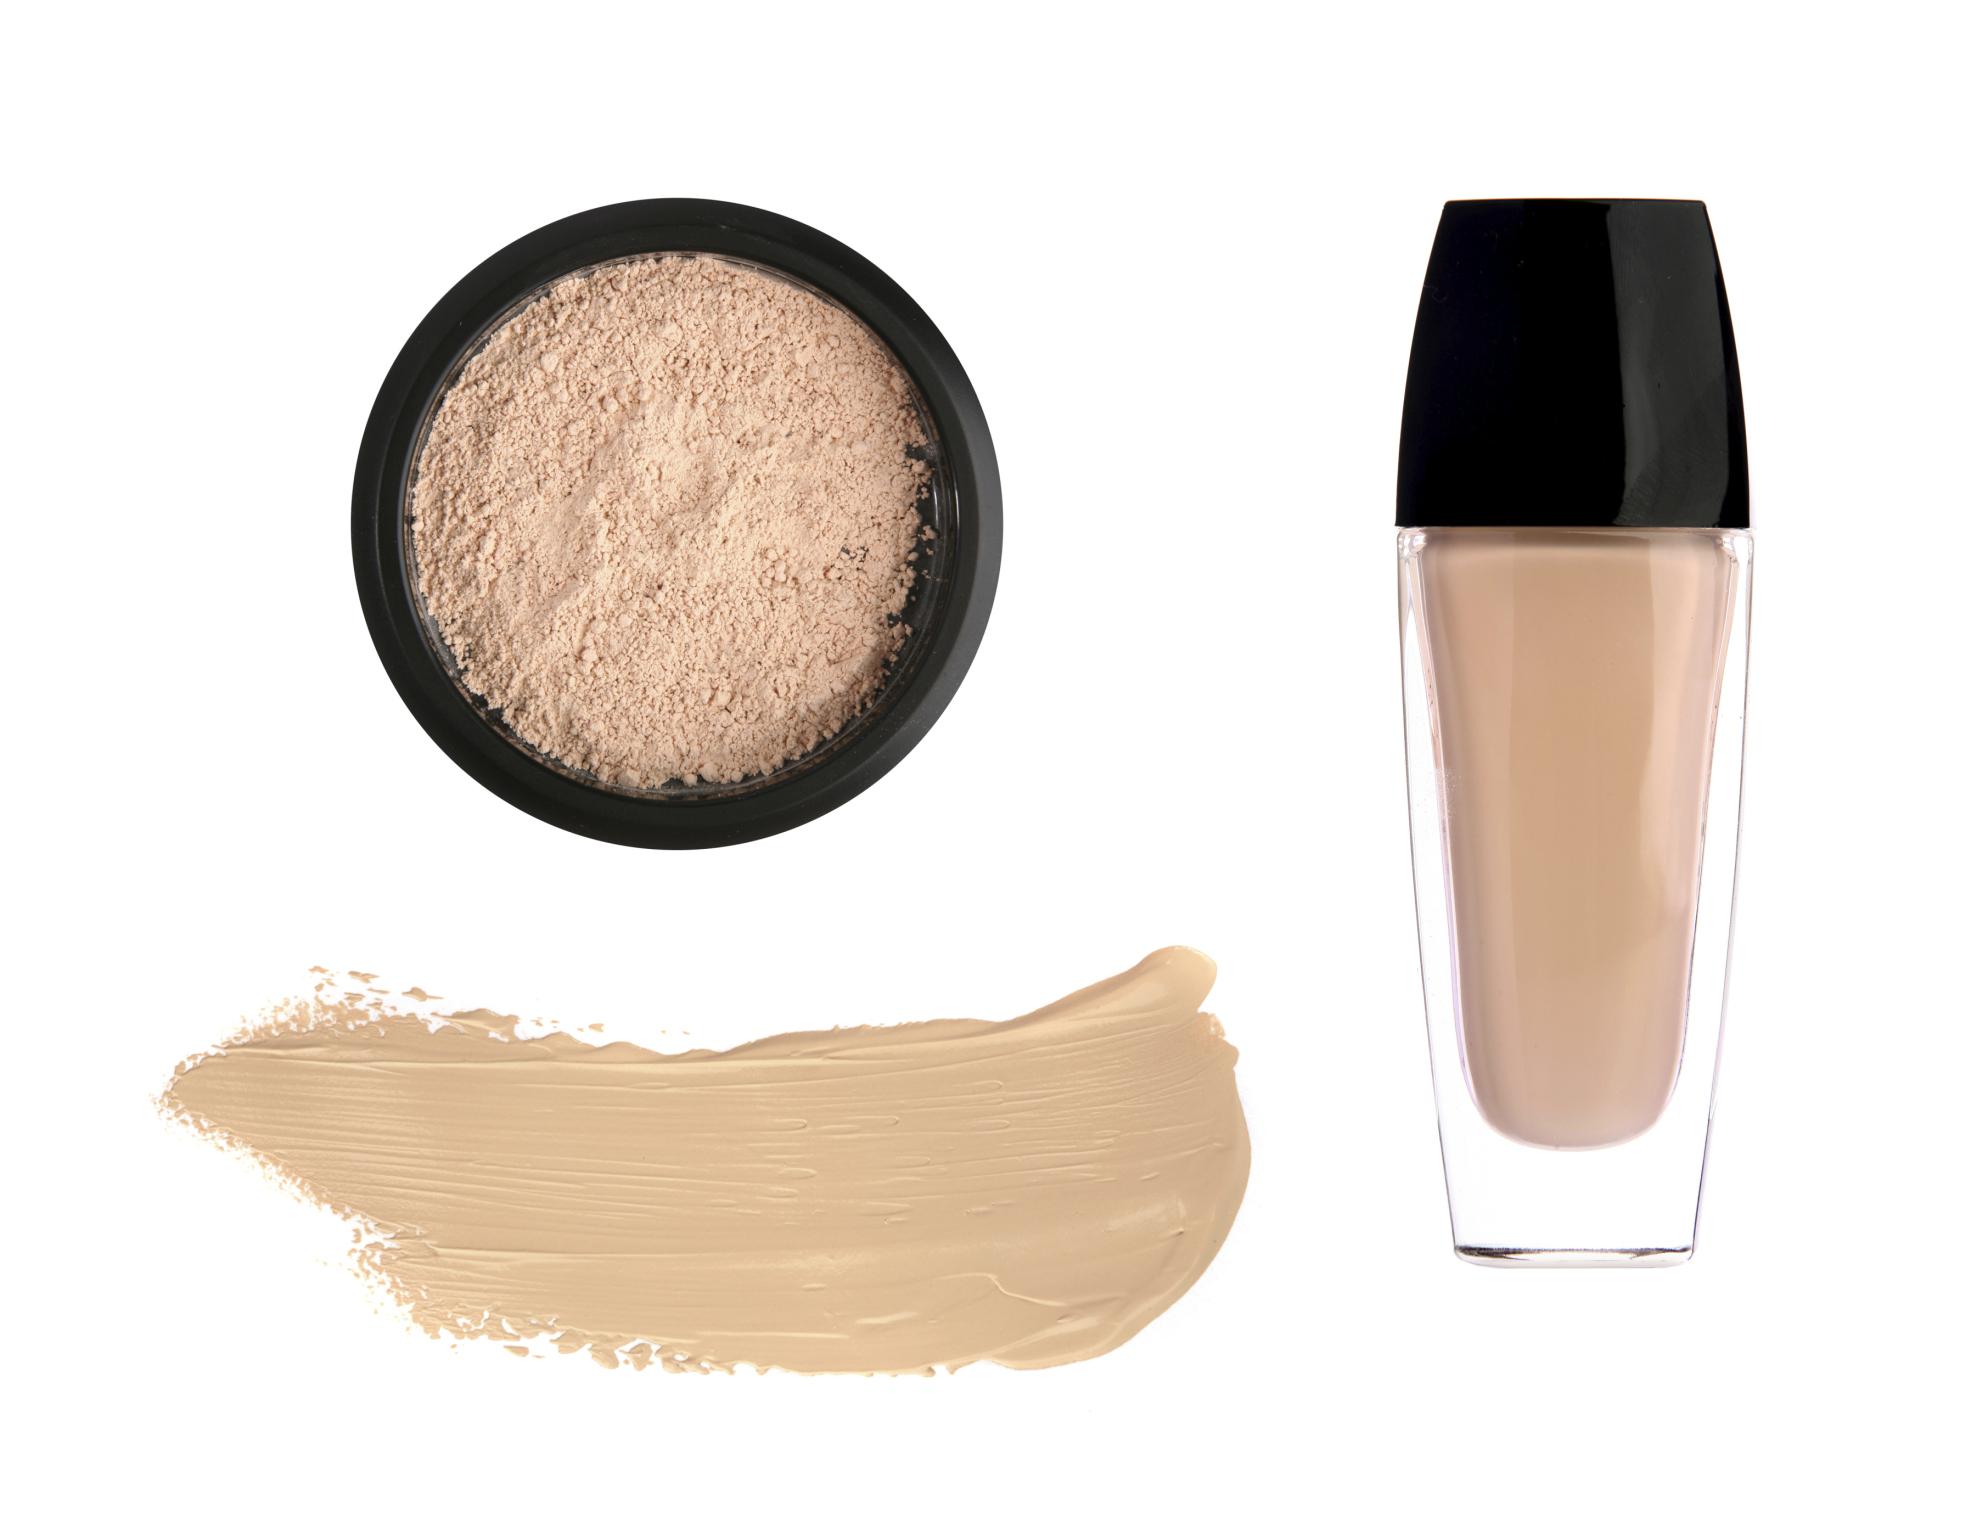 Tone cream and cosmetic powder